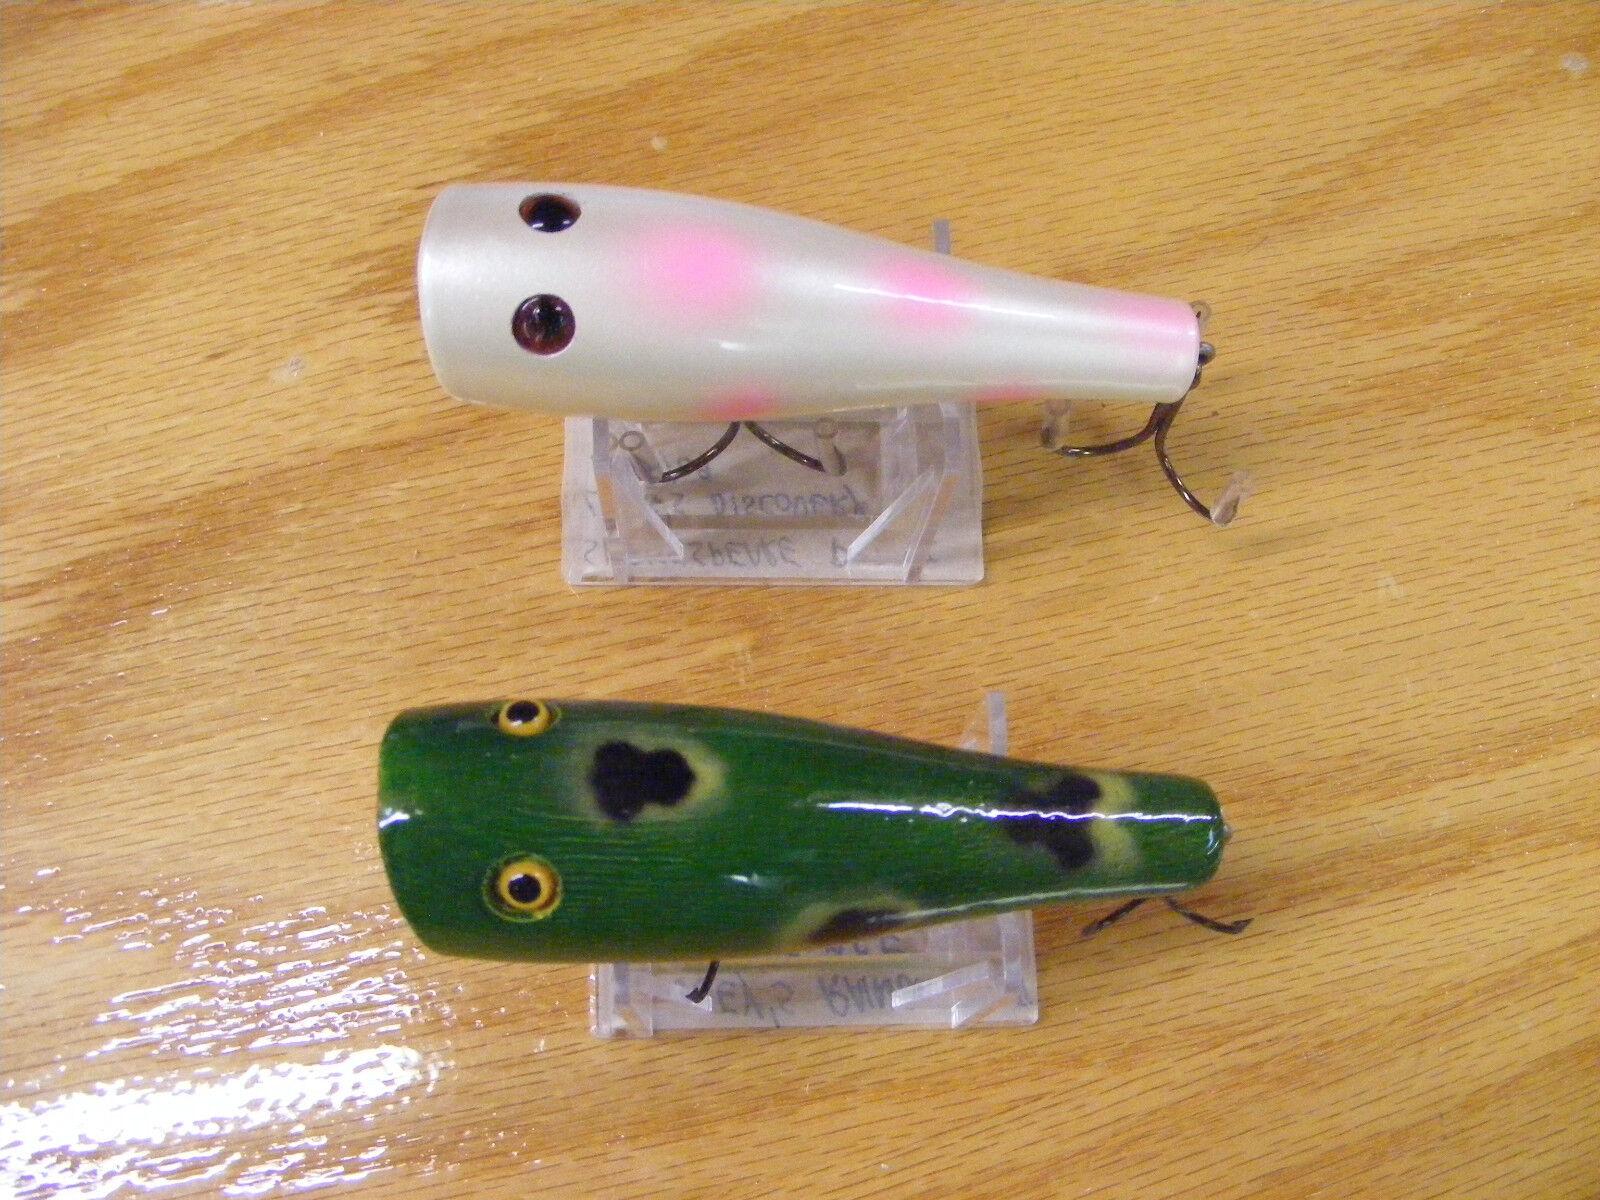 2 Beautiful Vintage Original Glasseye Plunkers in Pearl and Frog colors